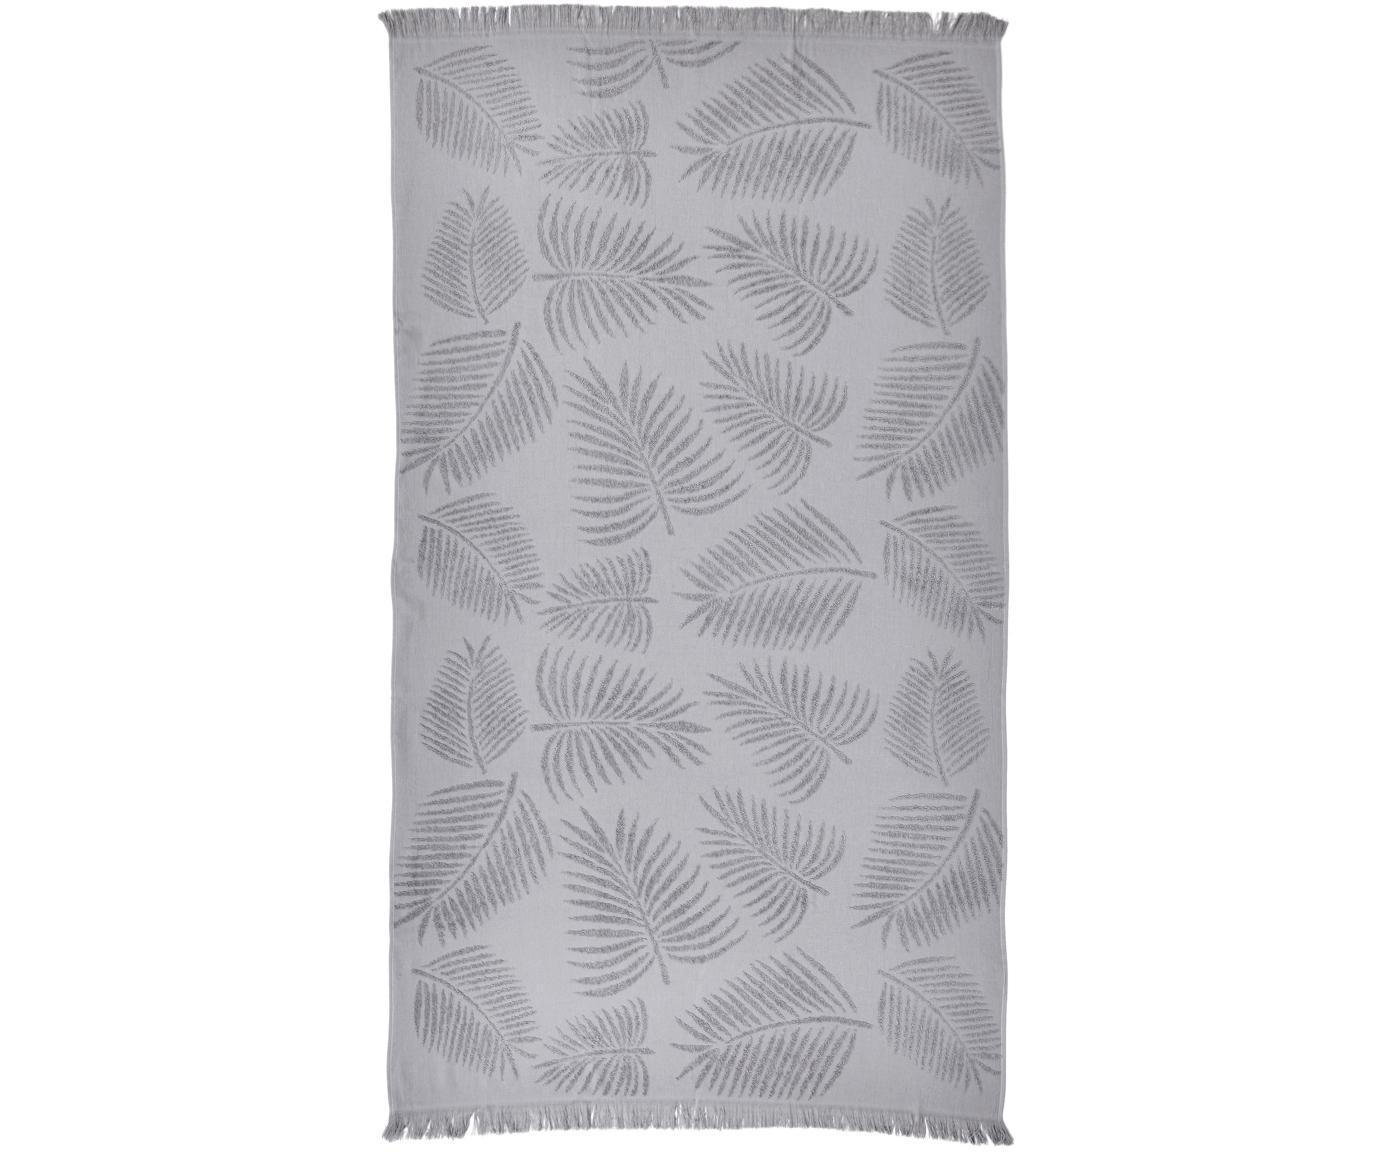 Telo mare in cotone Capri Palm Leaves, Grigio argento, Larg. 90 x Lung. 160 cm